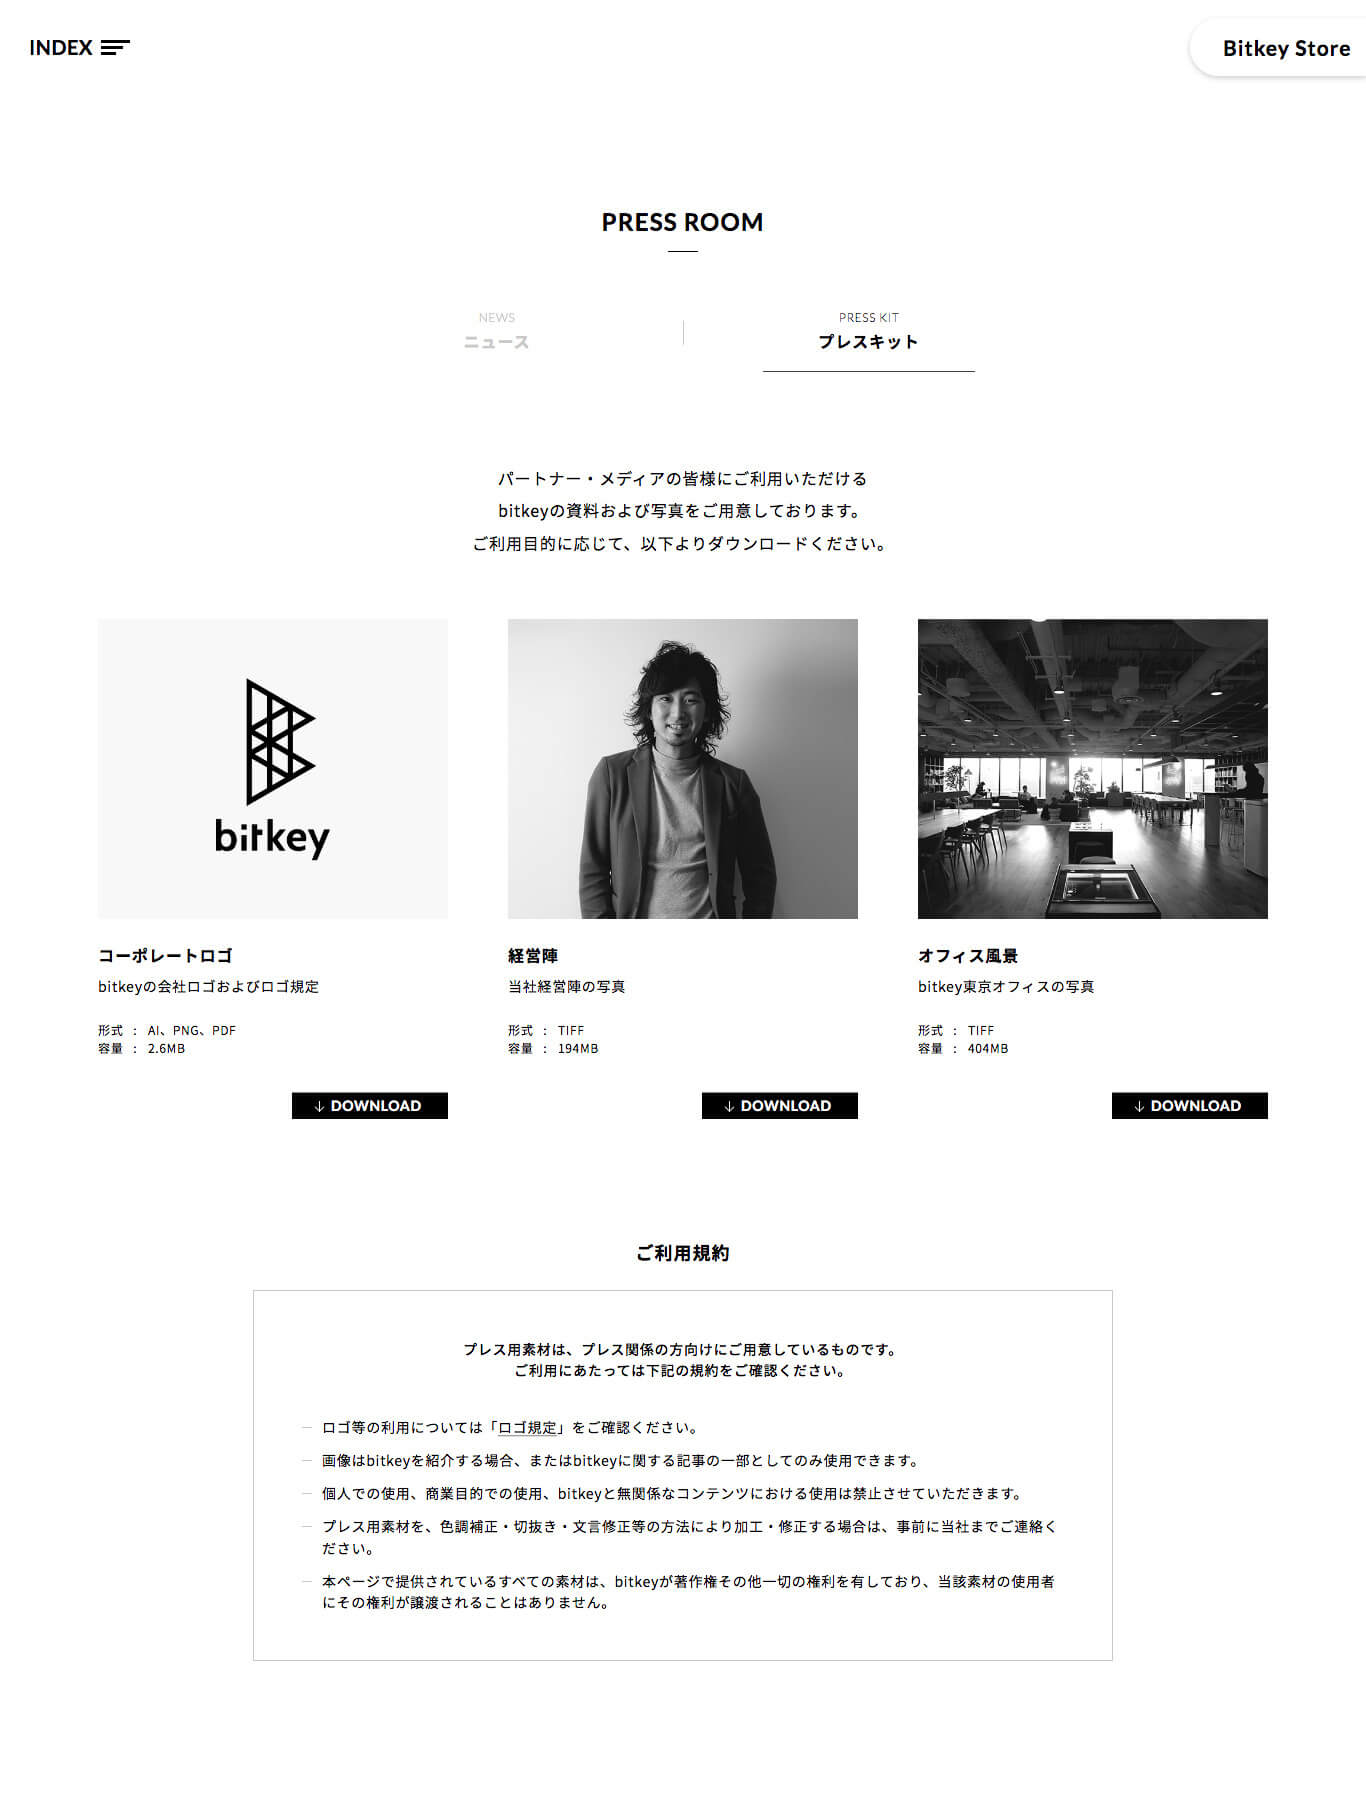 Bitkey inc. image